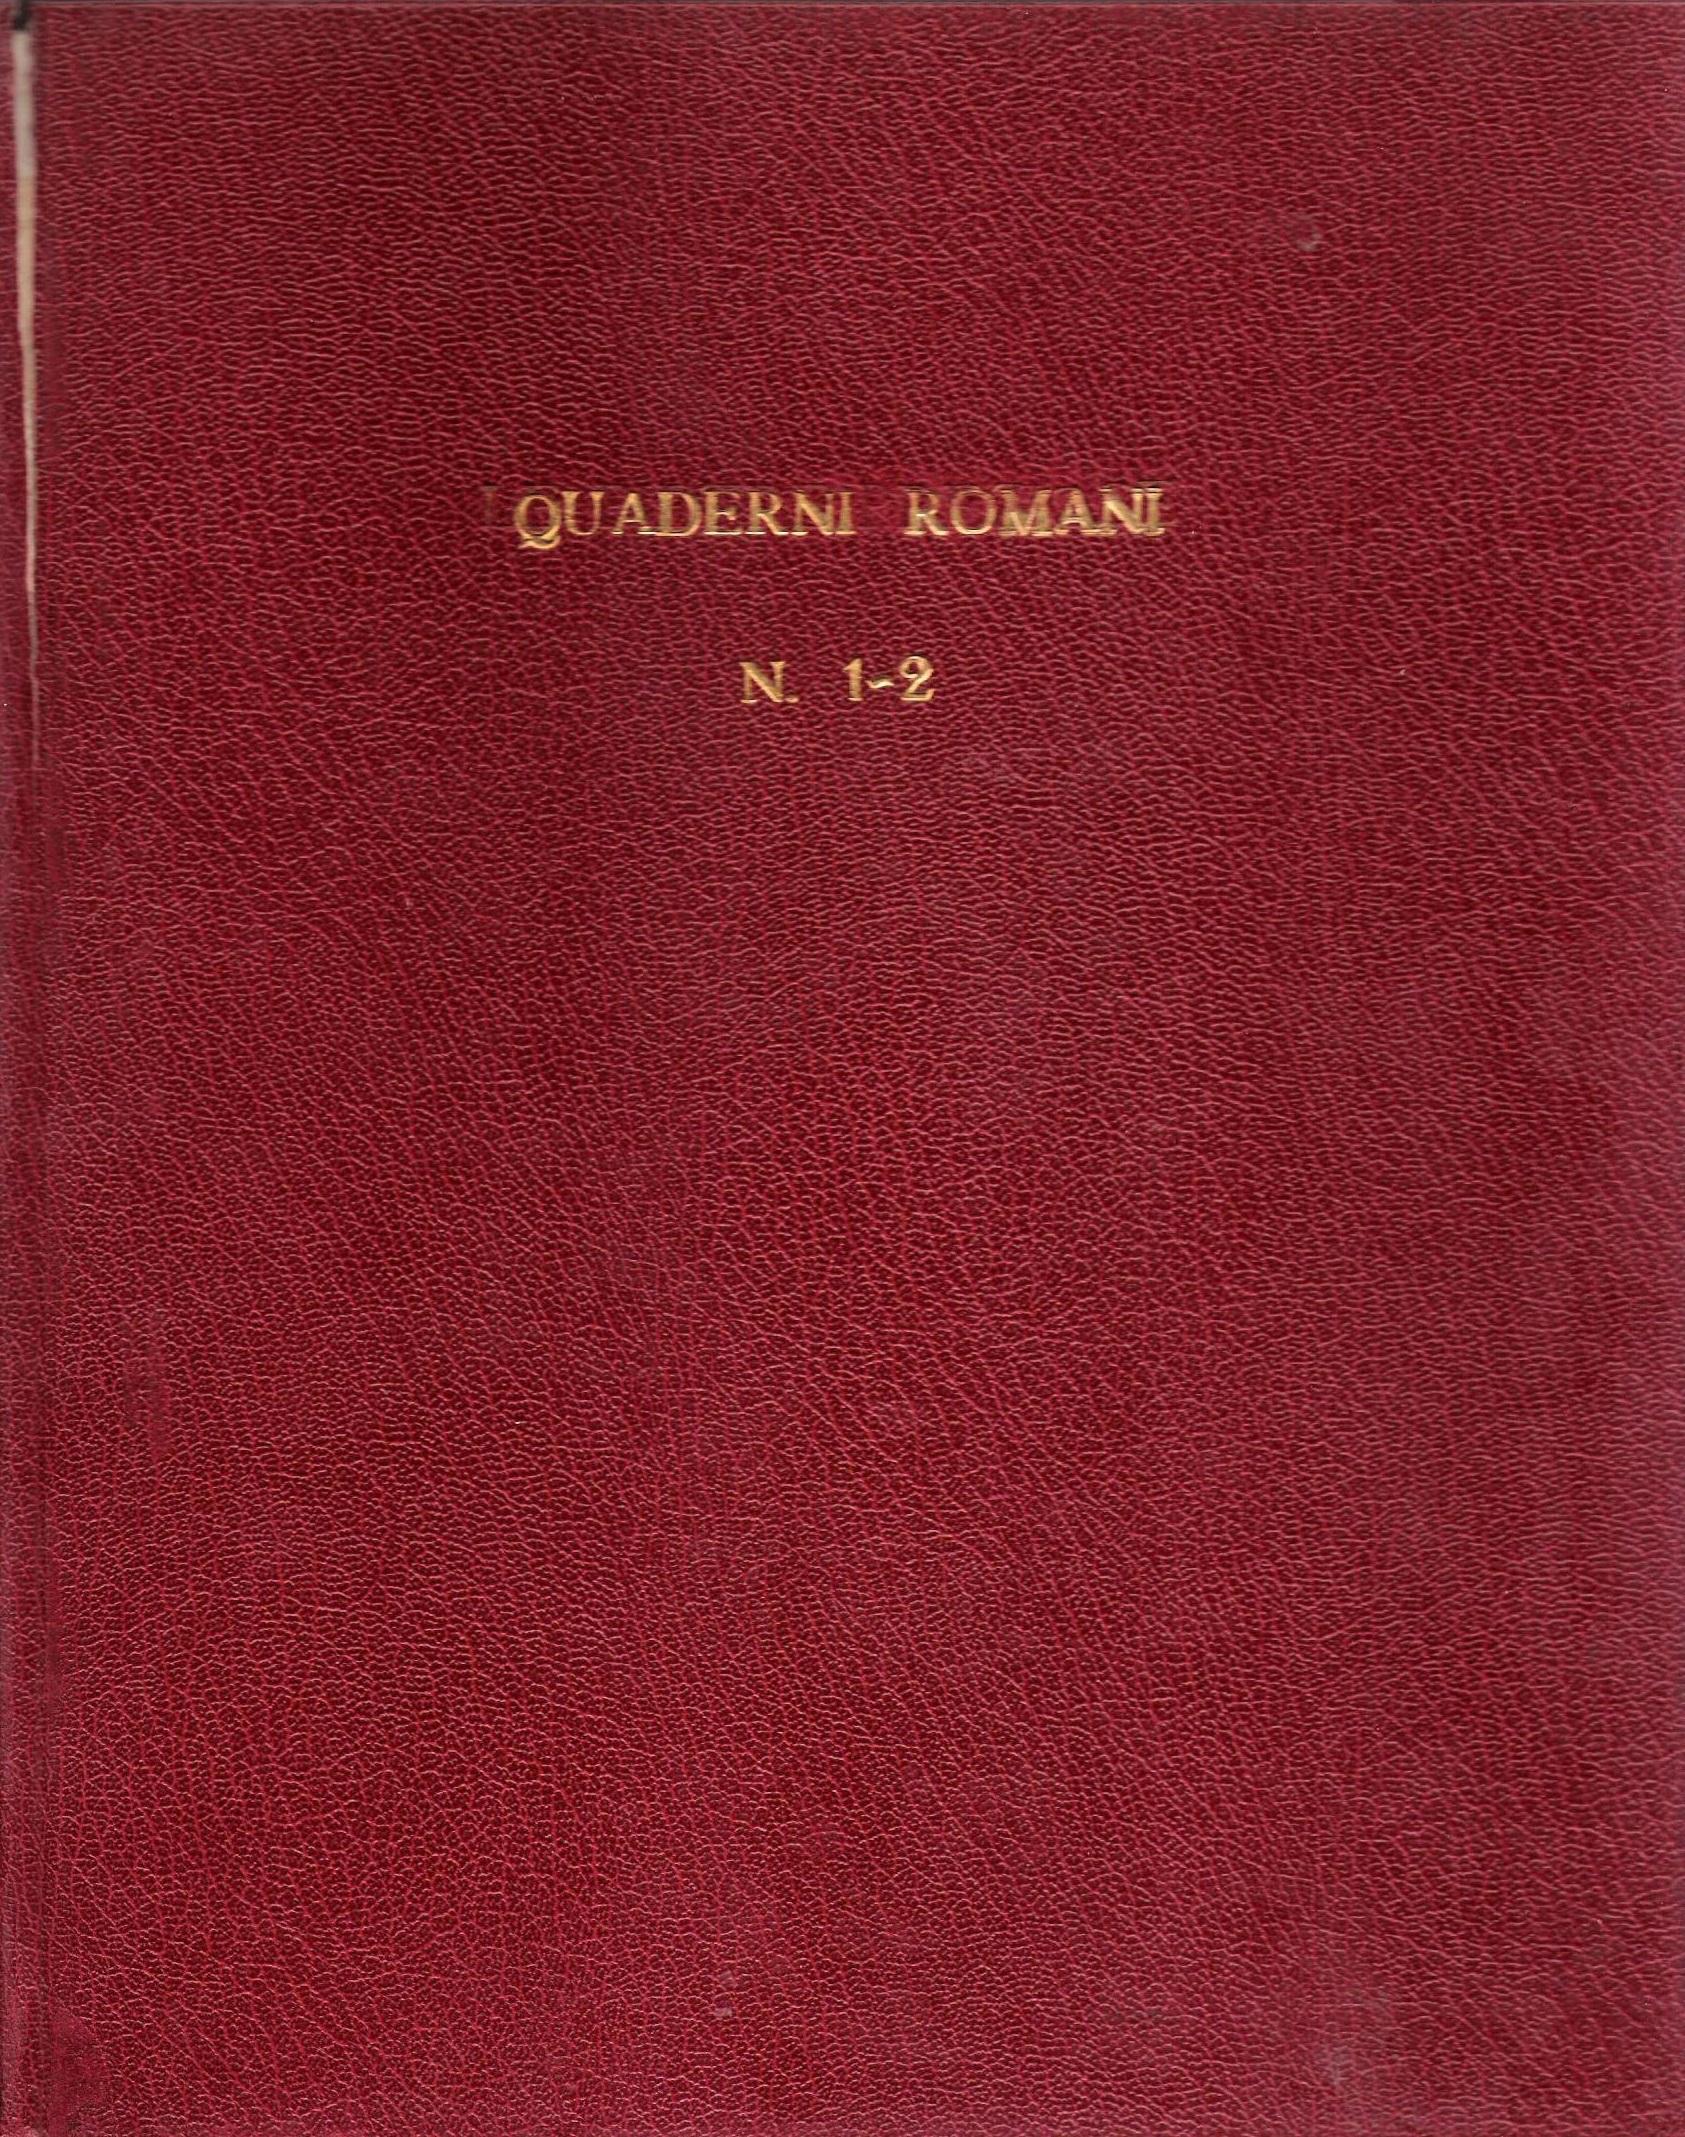 000 rivista quaderni romani1broshure art Abbate